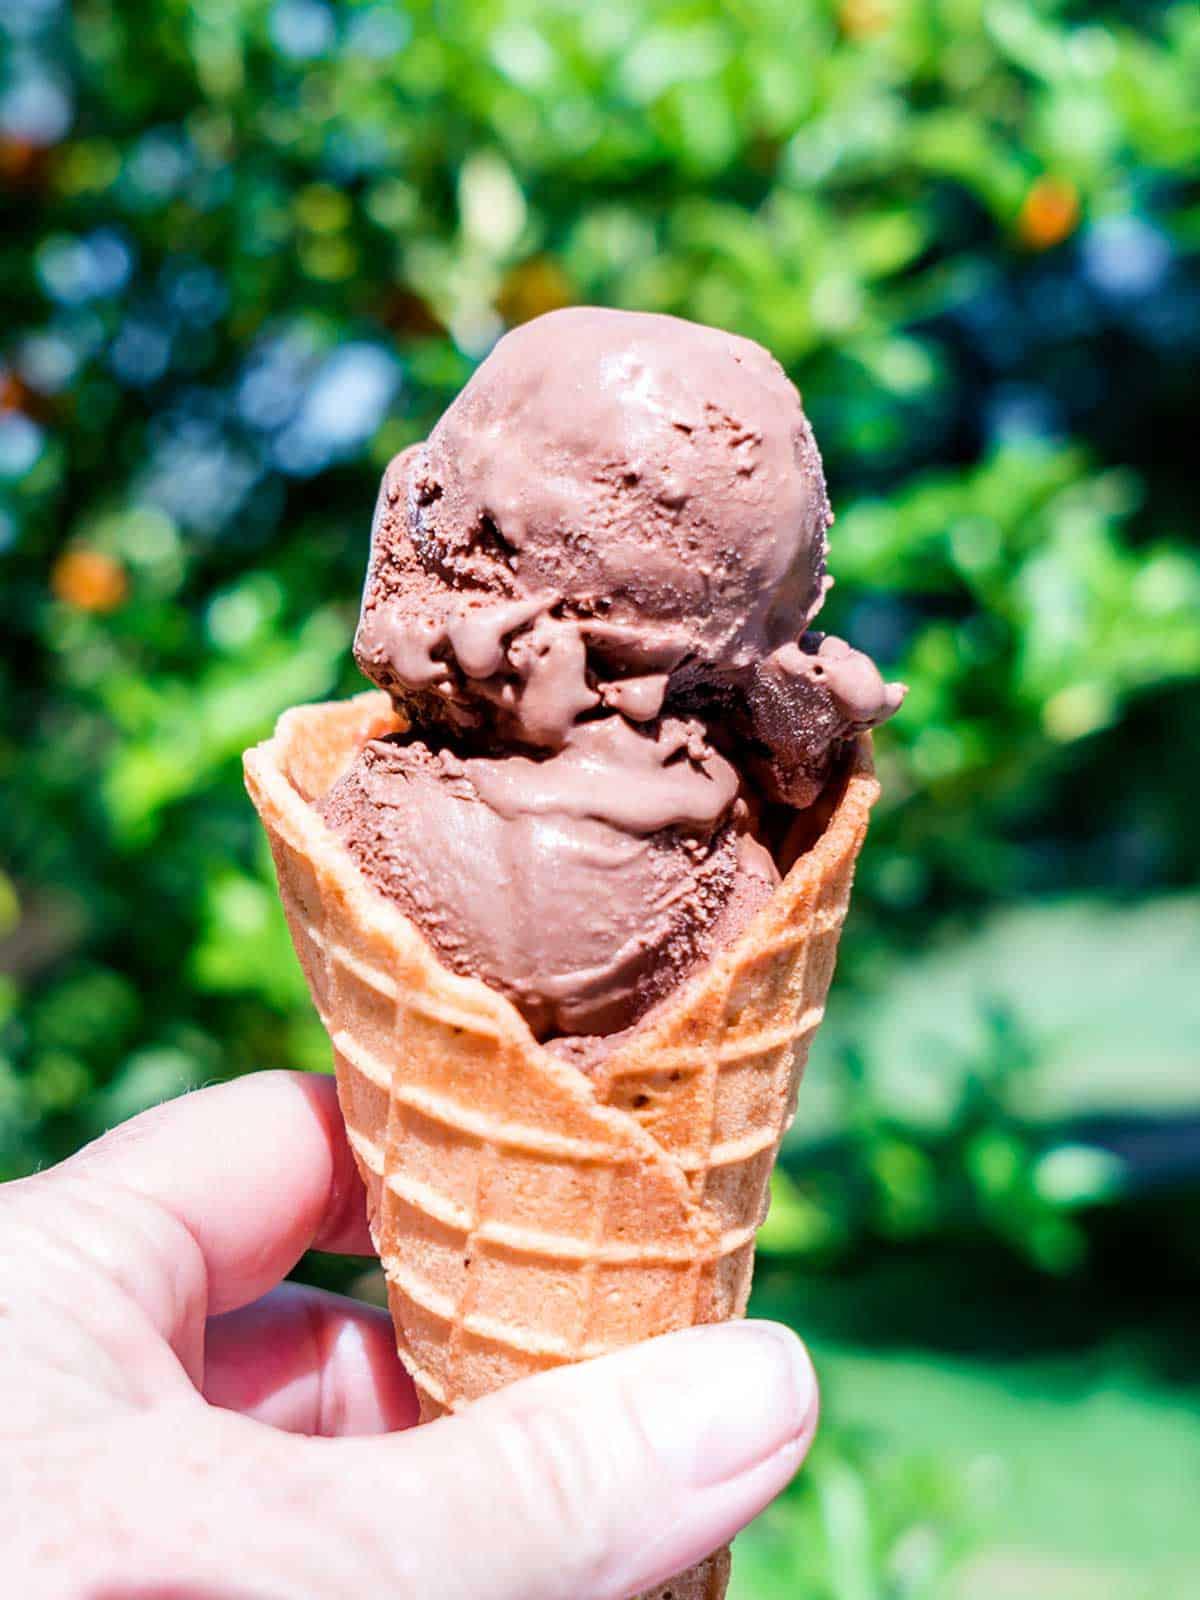 Triple Chocolate Ice Cream in Waffle Cone